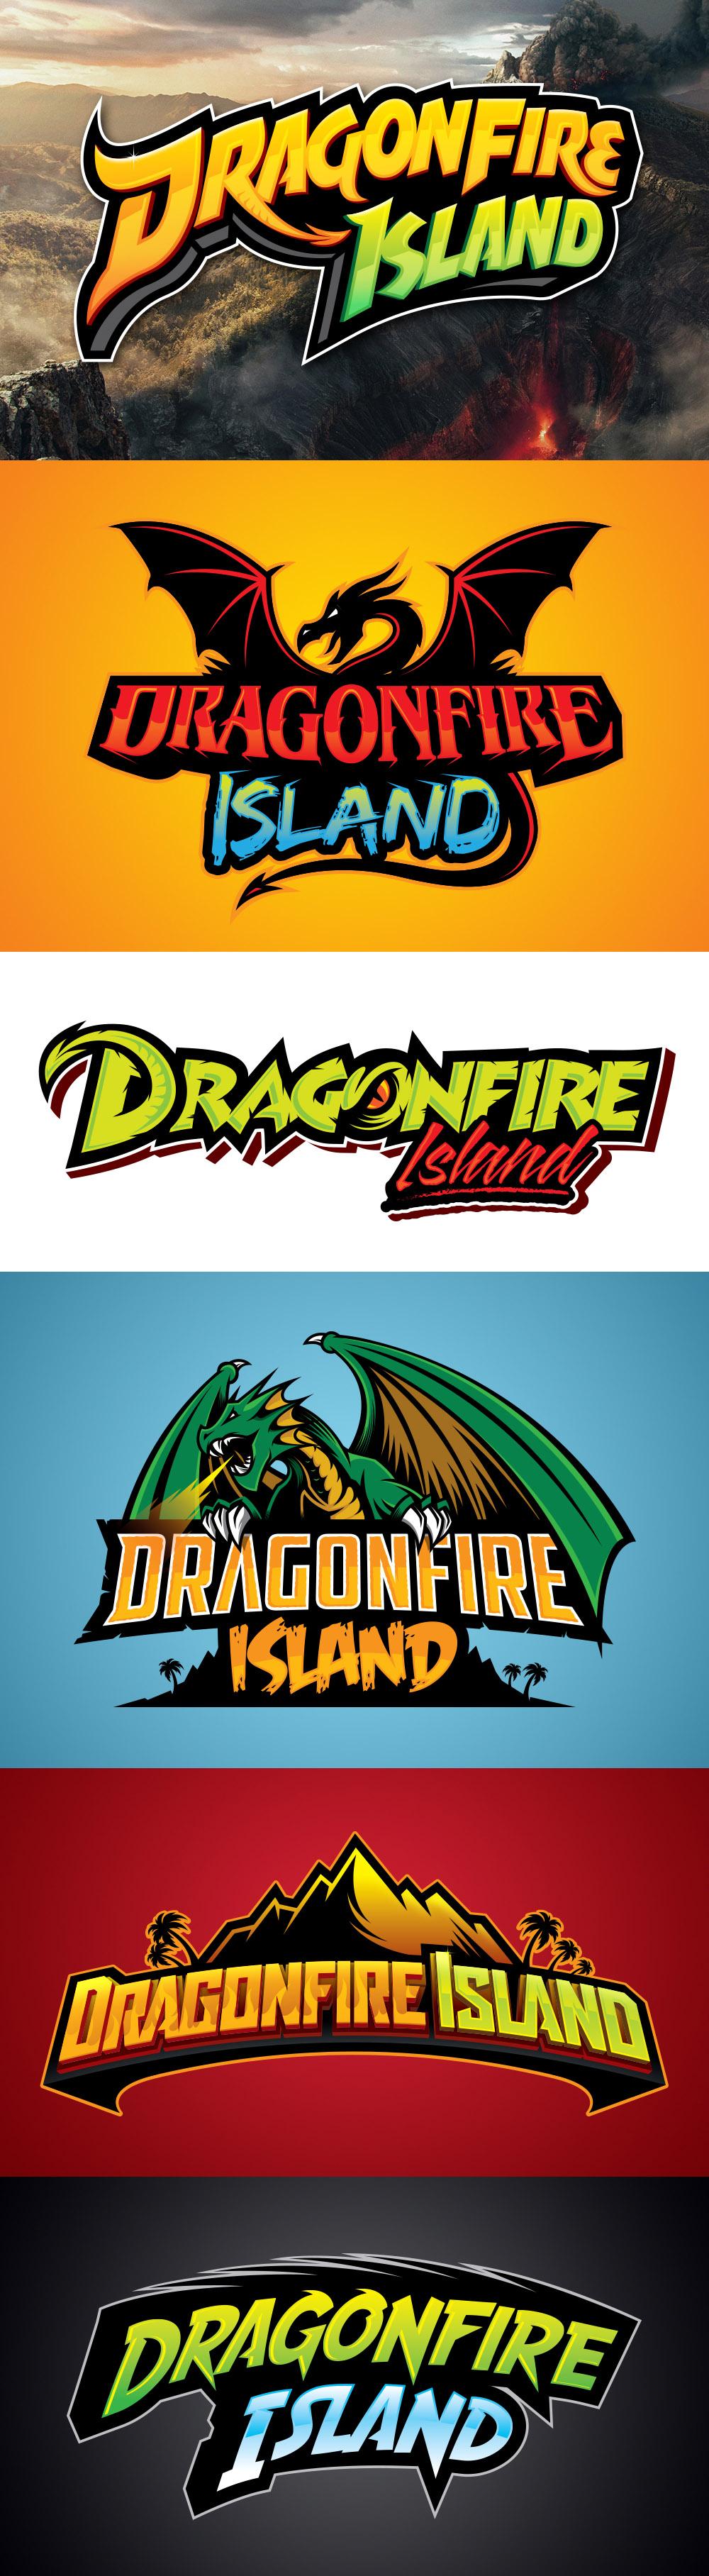 DragonfireIsland1.jpg